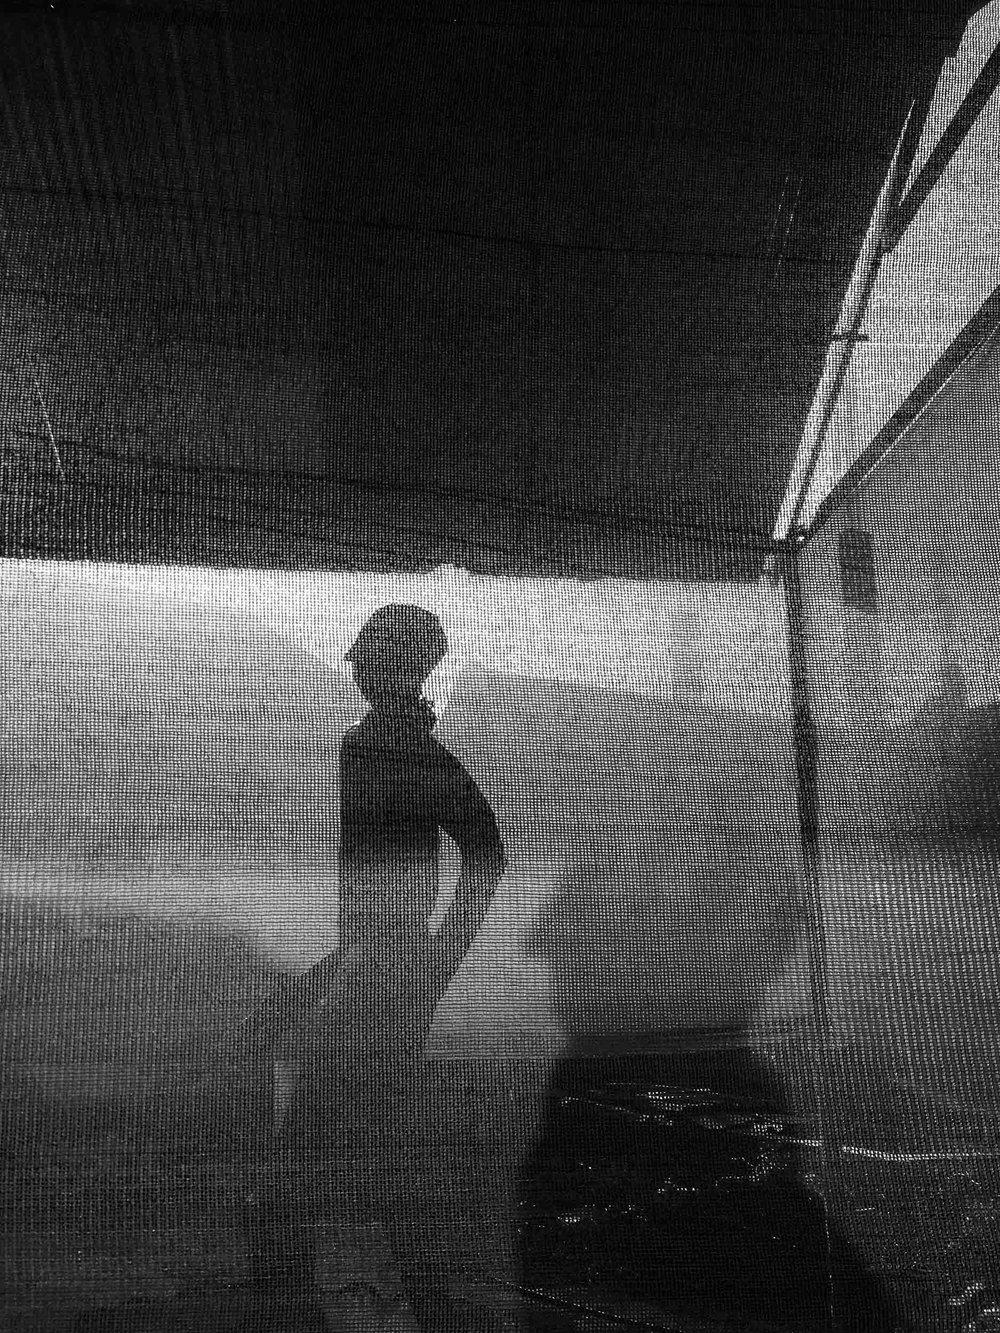 Sindhur_Photography_Kochi Muziris Biennale -2019-61.JPG